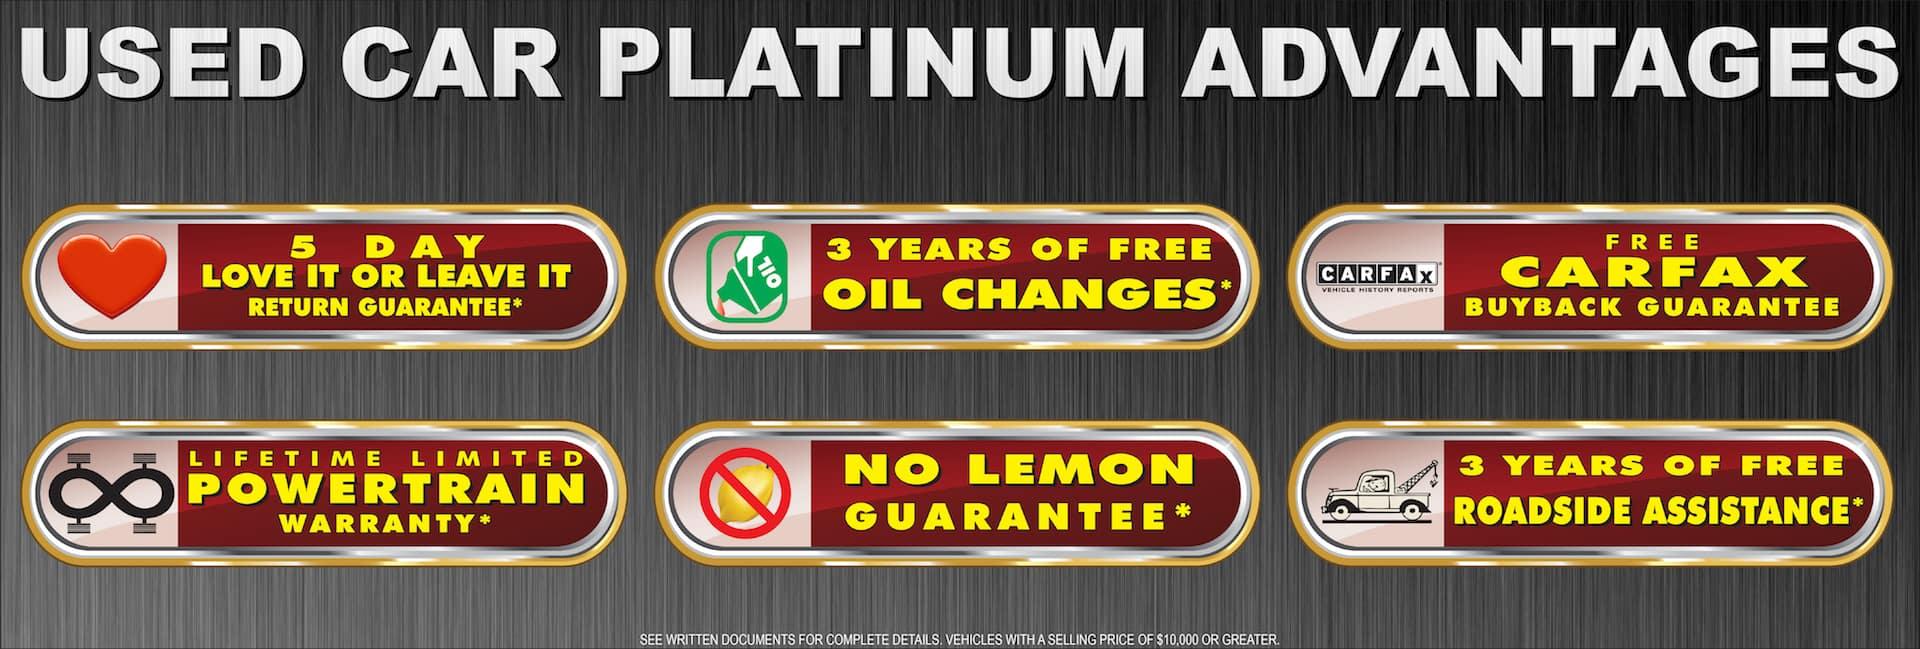 FMN_3.24.2021 Campaign_Platinum Adv_Website Banner